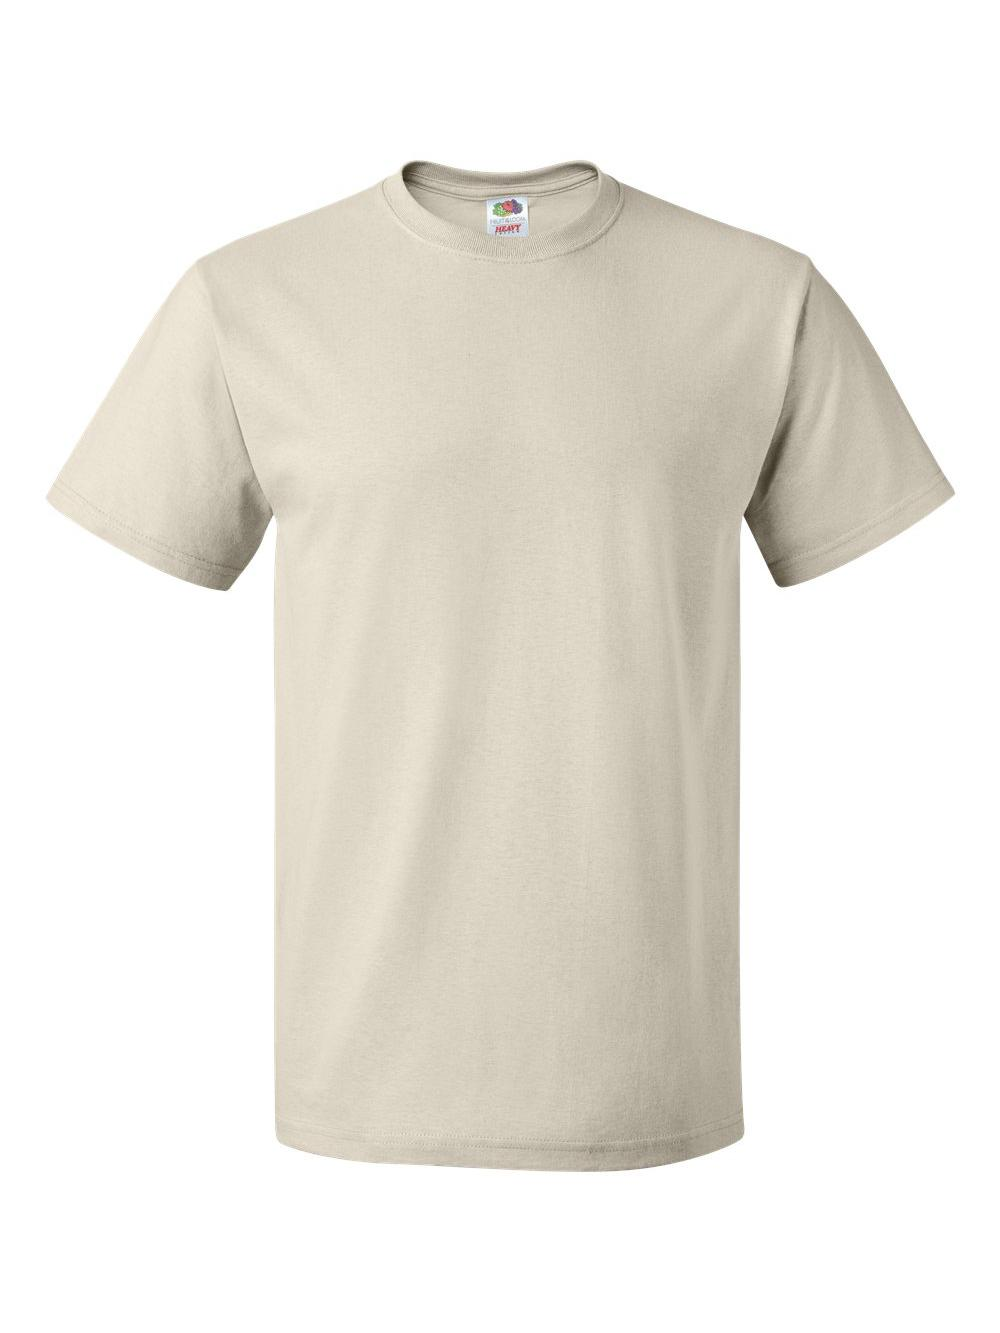 Fruit-of-the-Loom-HD-Cotton-Short-Sleeve-T-Shirt-3930R thumbnail 78